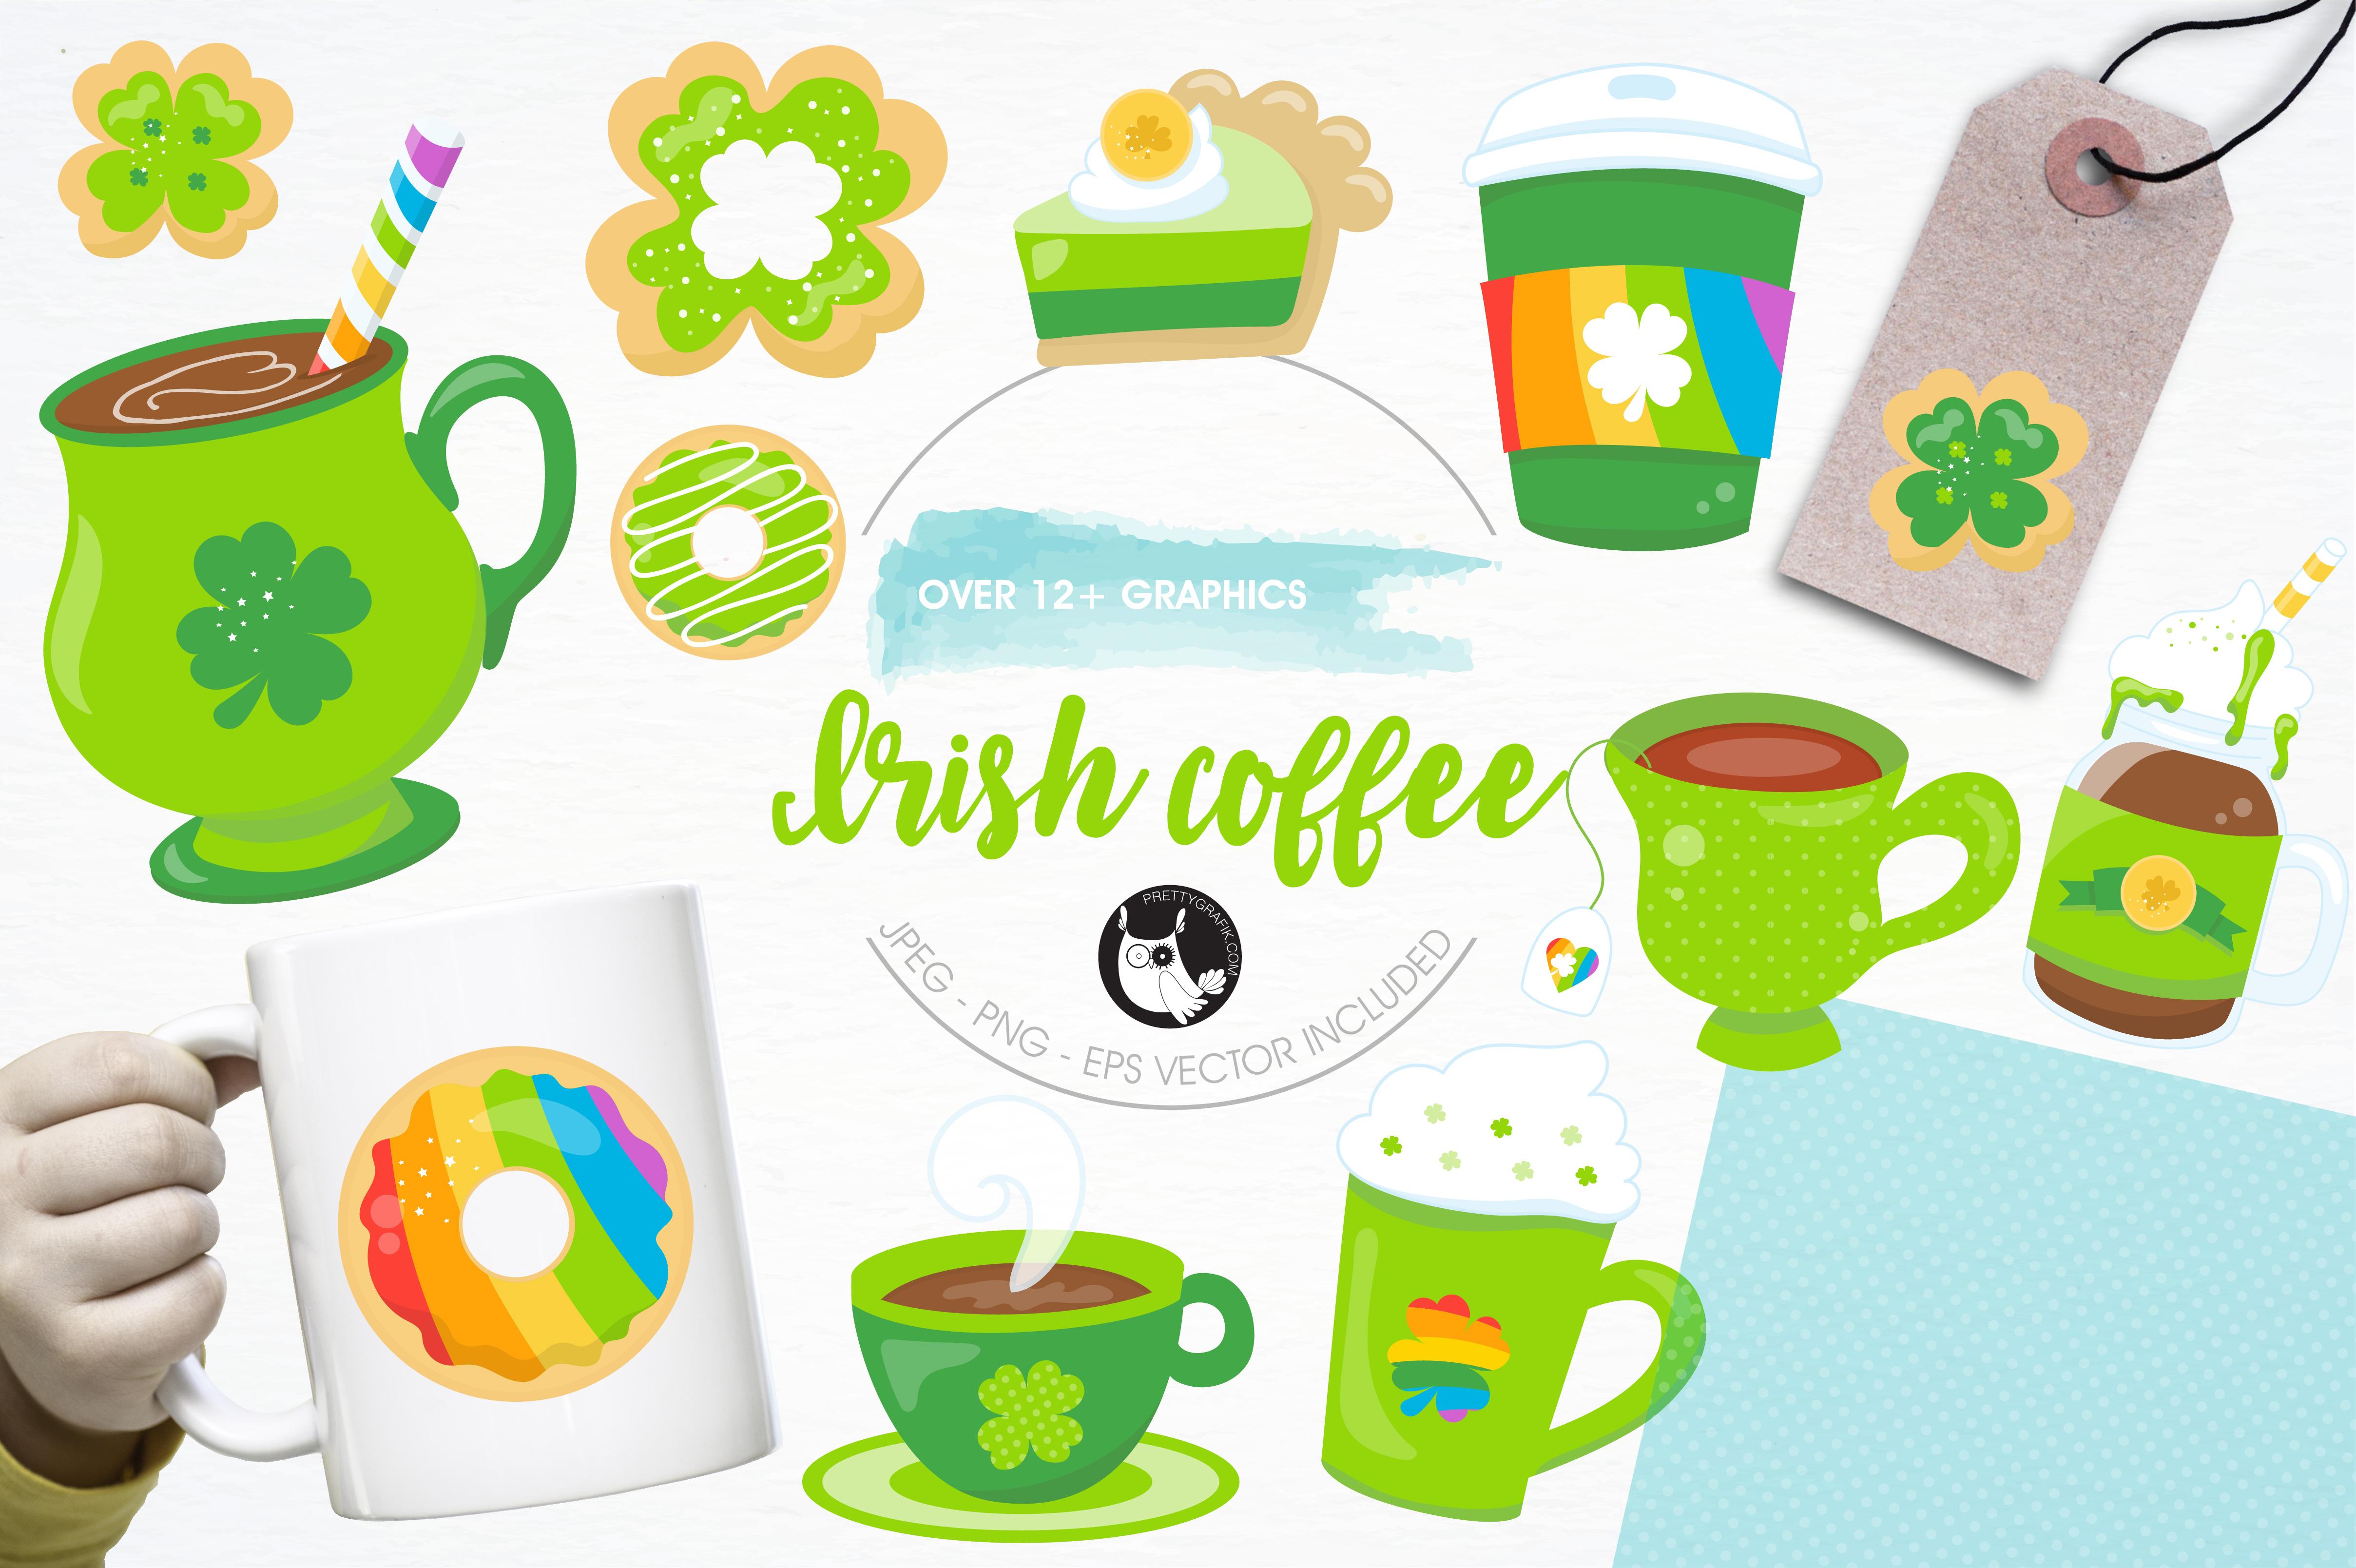 Irish coffee graphics and illustrations example image 1